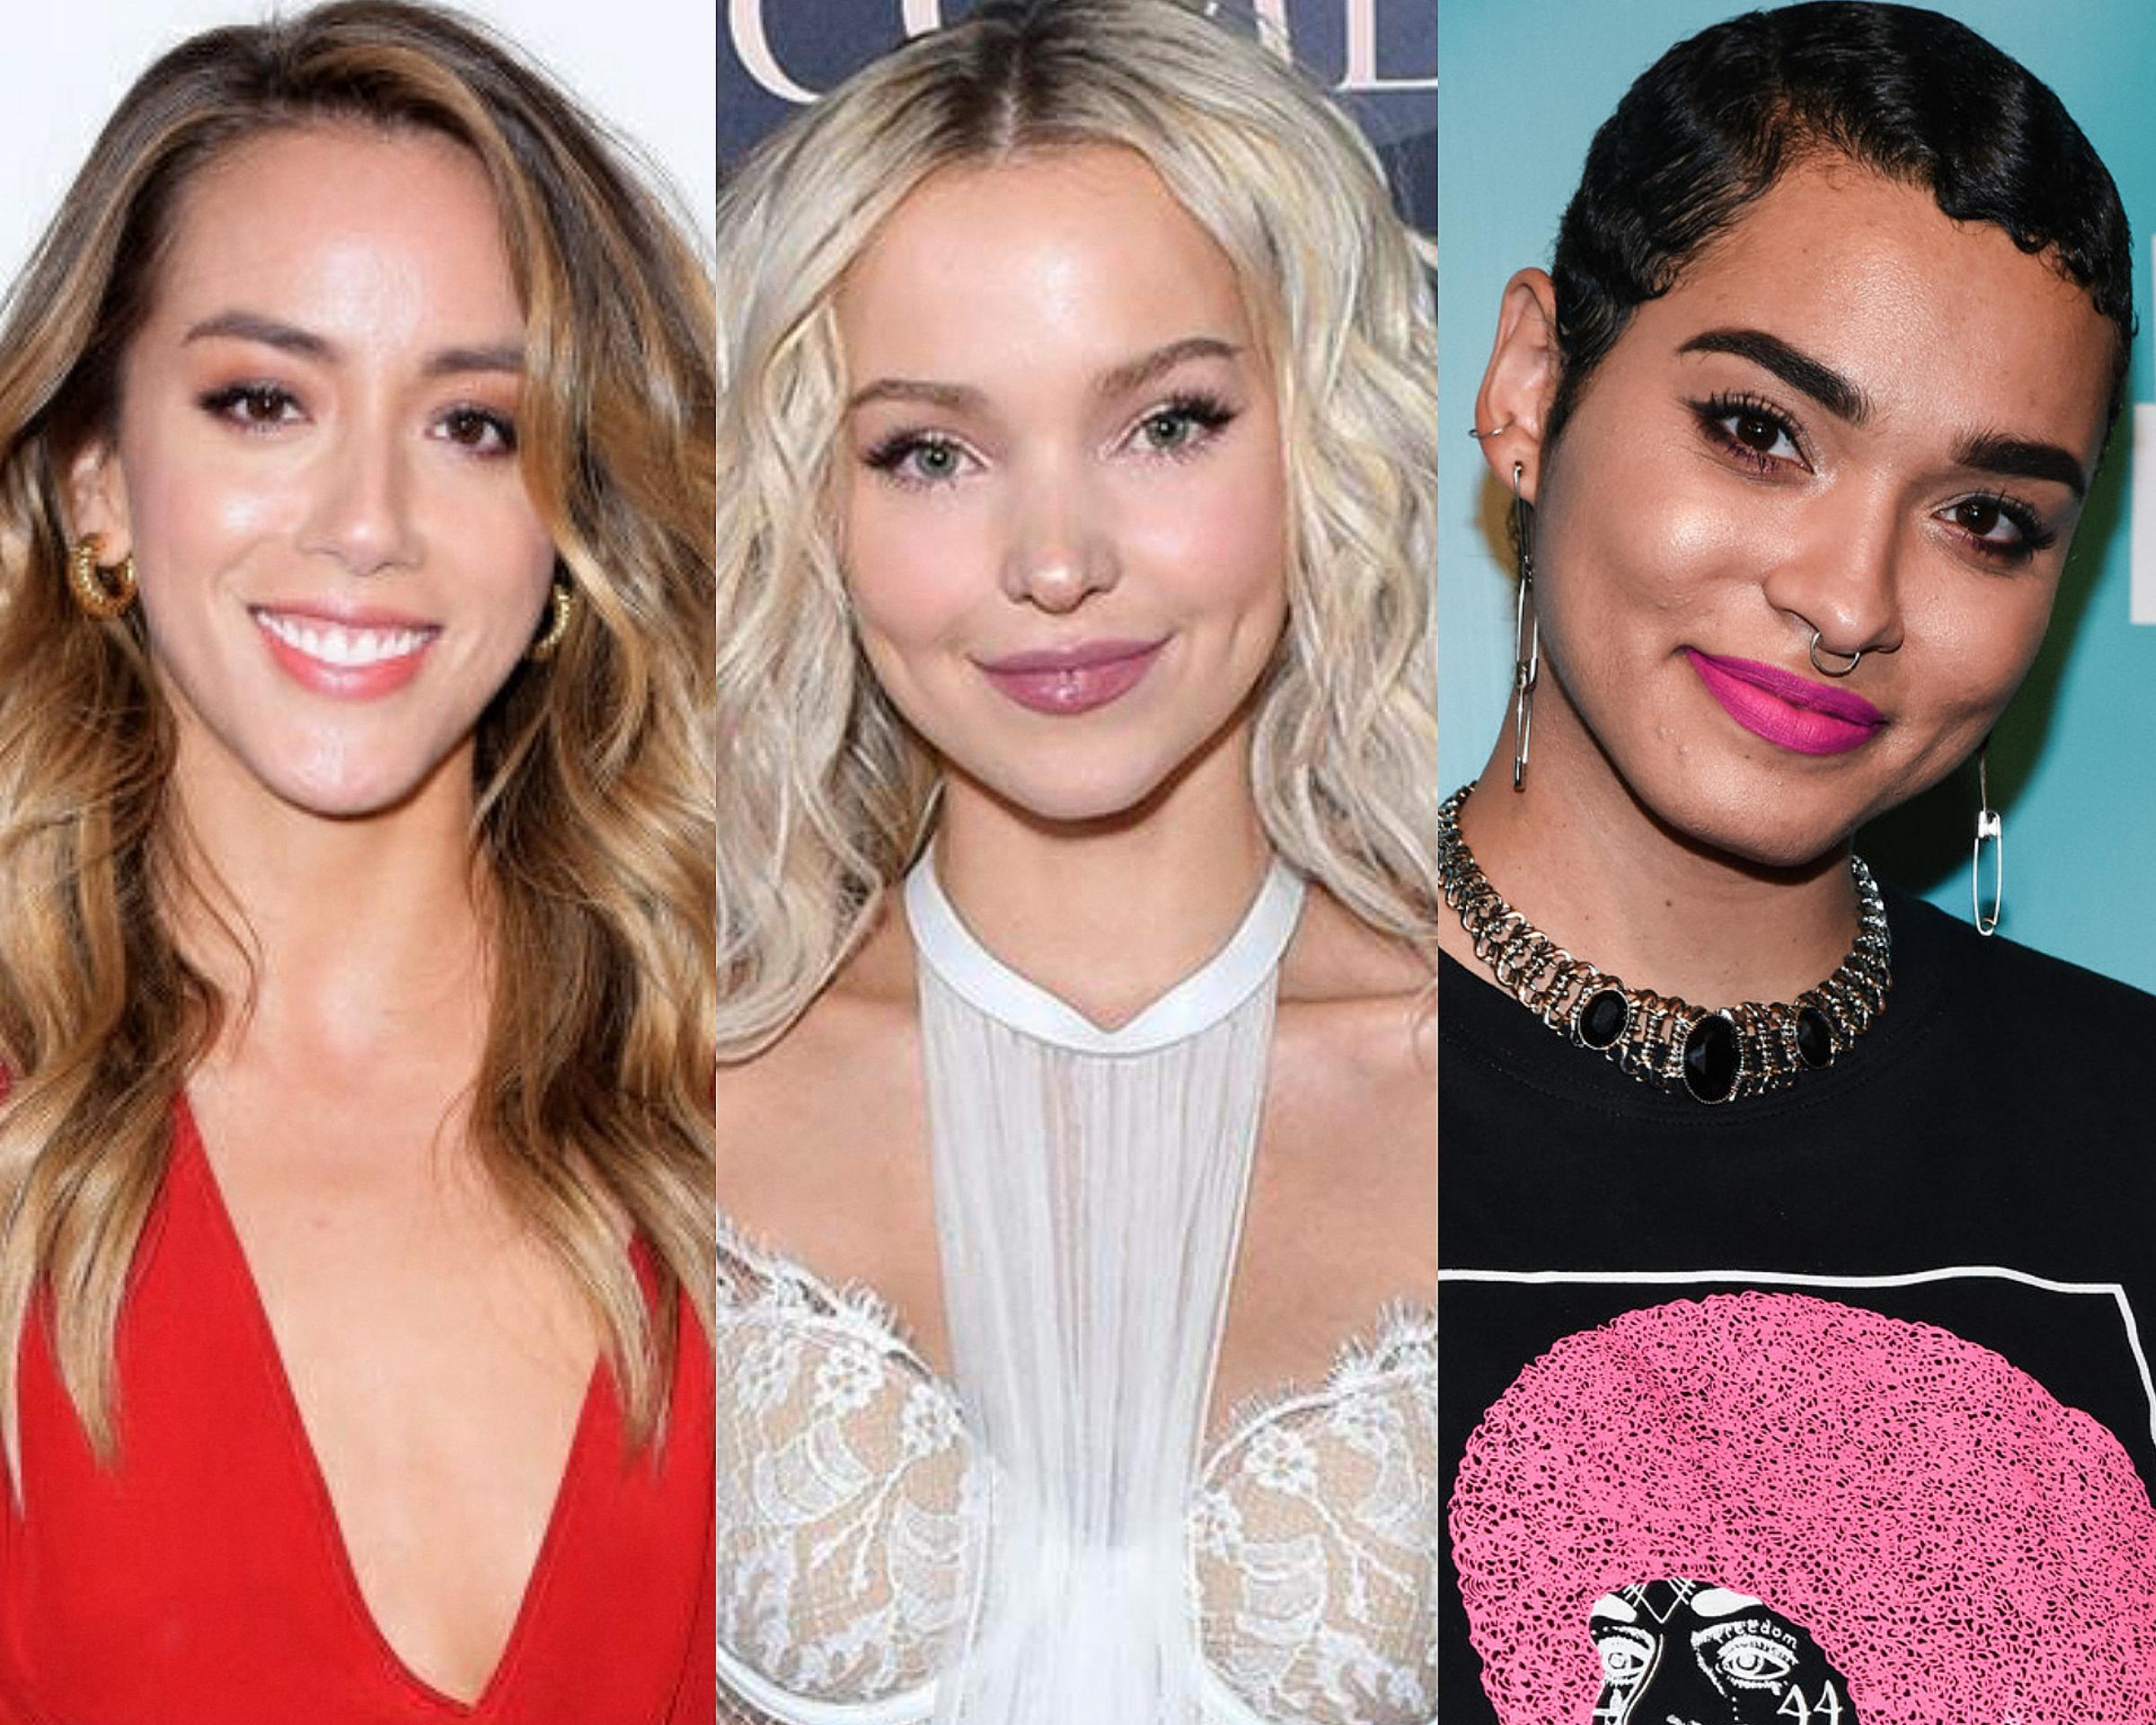 Chloe Bennet, Dove Cameron & Yana Perrault Cast As Powerpuff Girls For CW Show